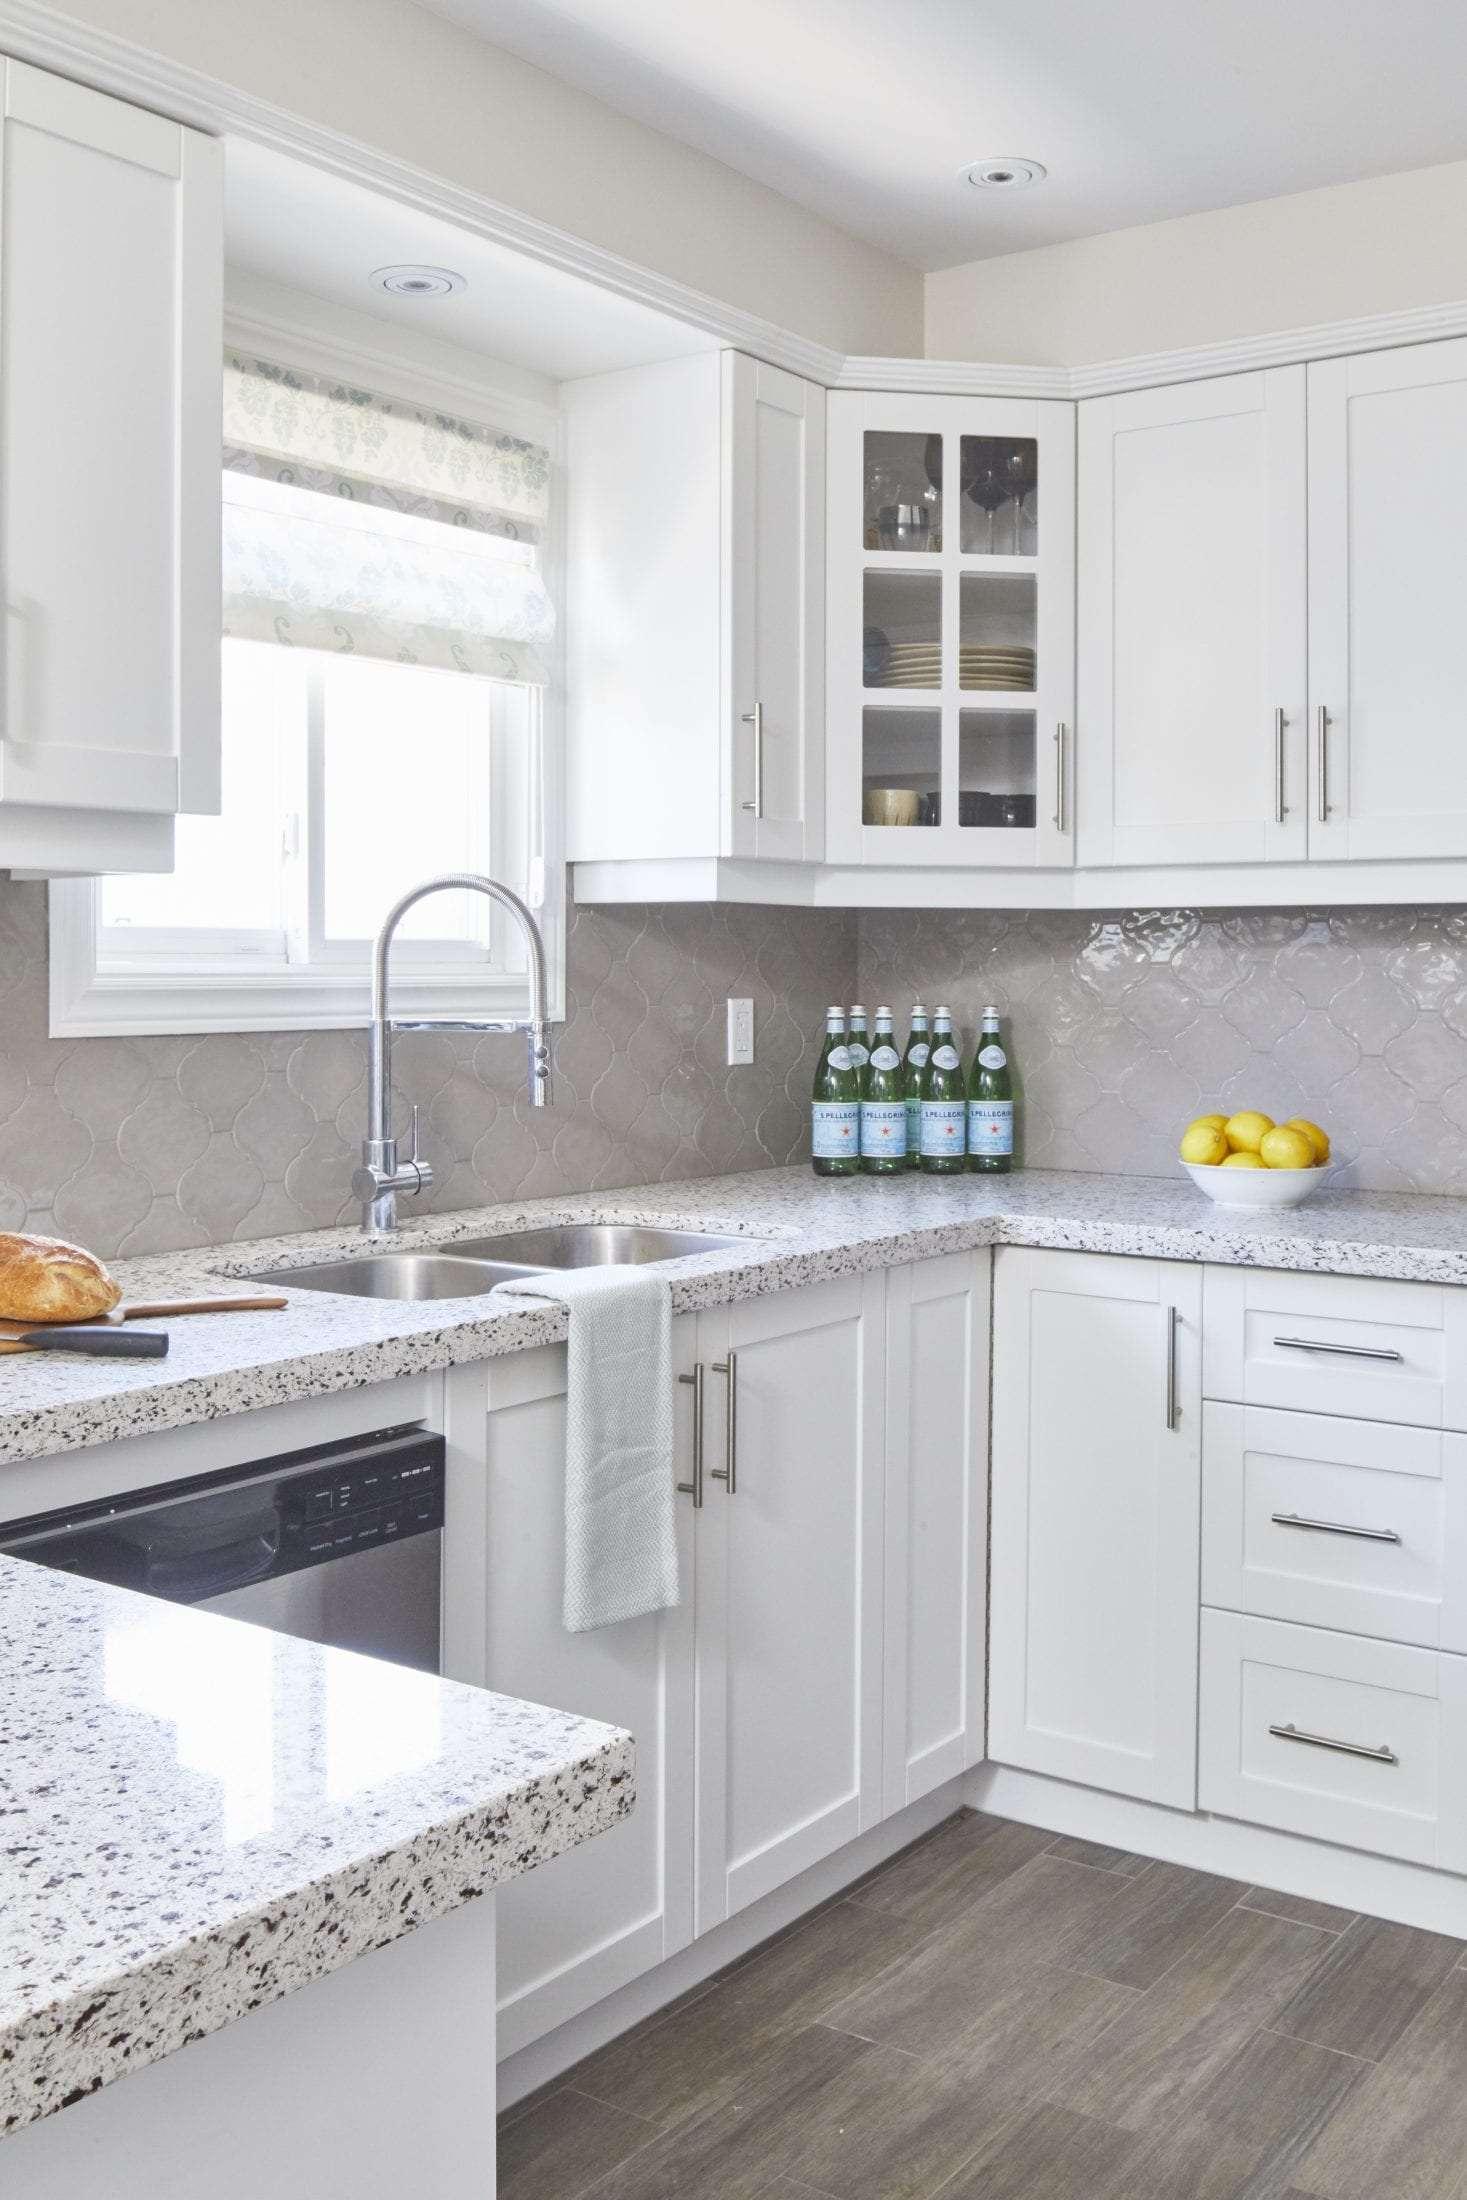 Kitchen renovation design orangeville, ON pamela lynn interiors